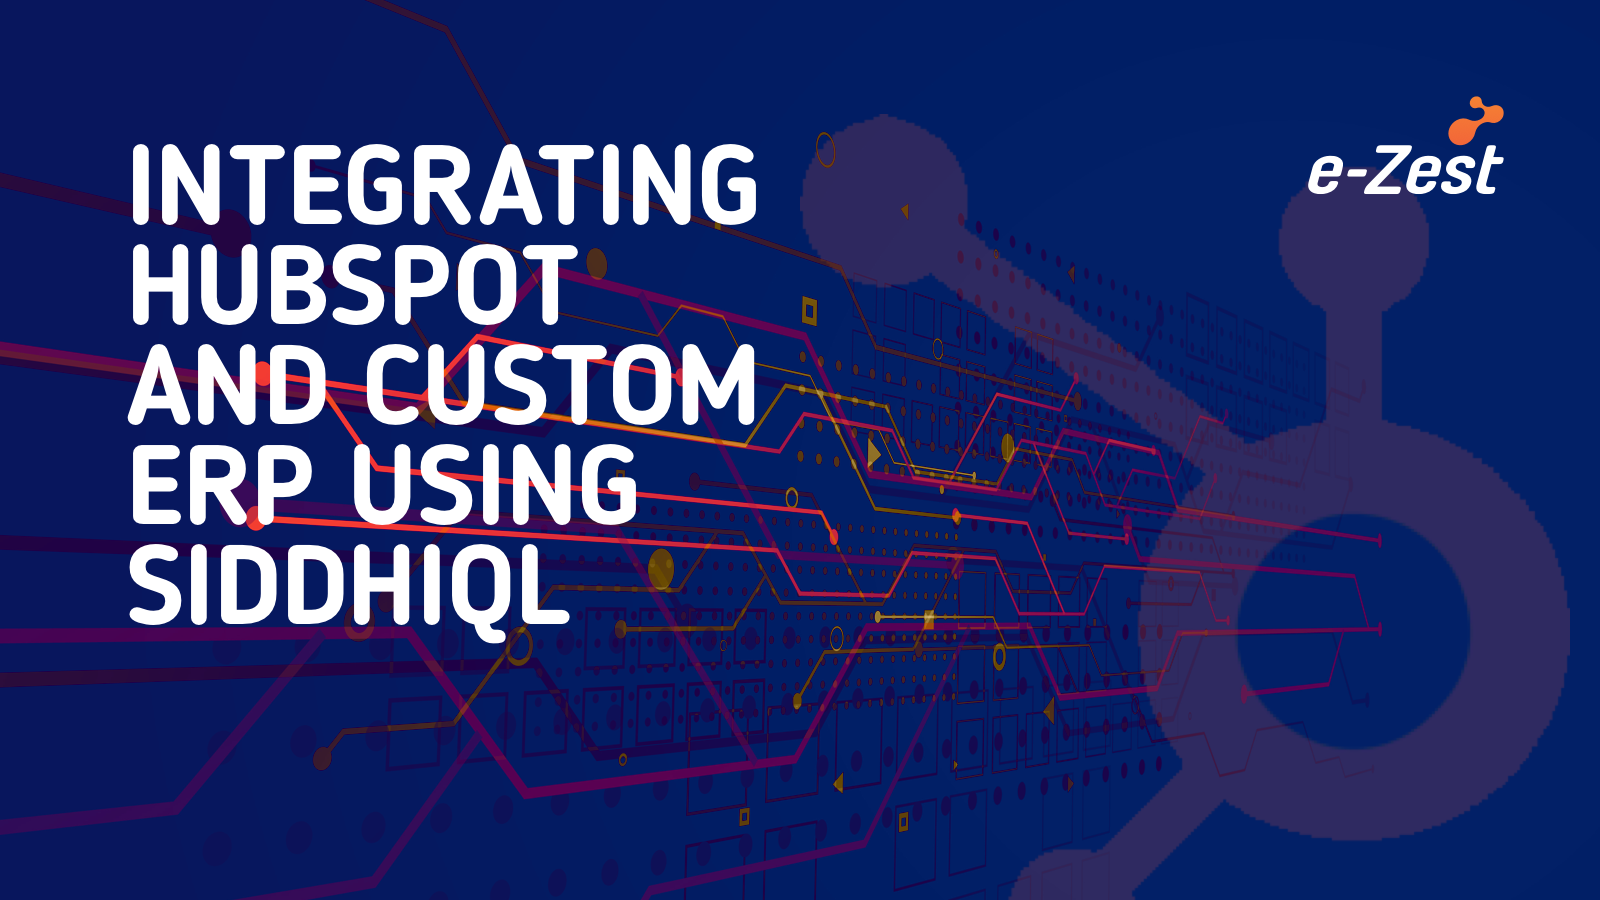 Integrating Hubspot and Custom ERP using SiddhiQL